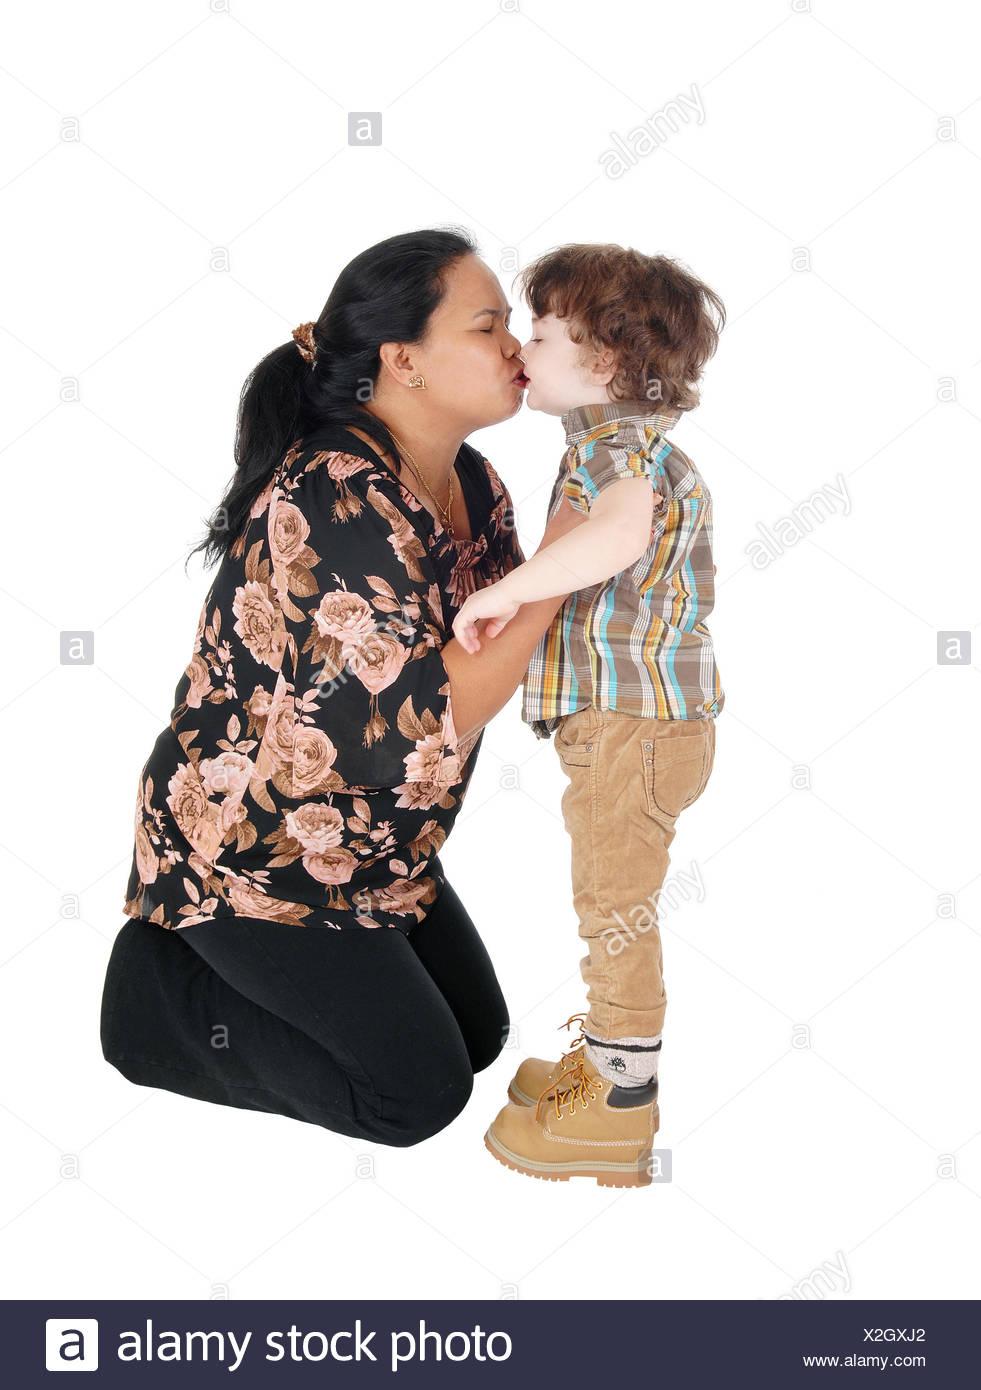 Nanny kisses her little boy. Stock Photo